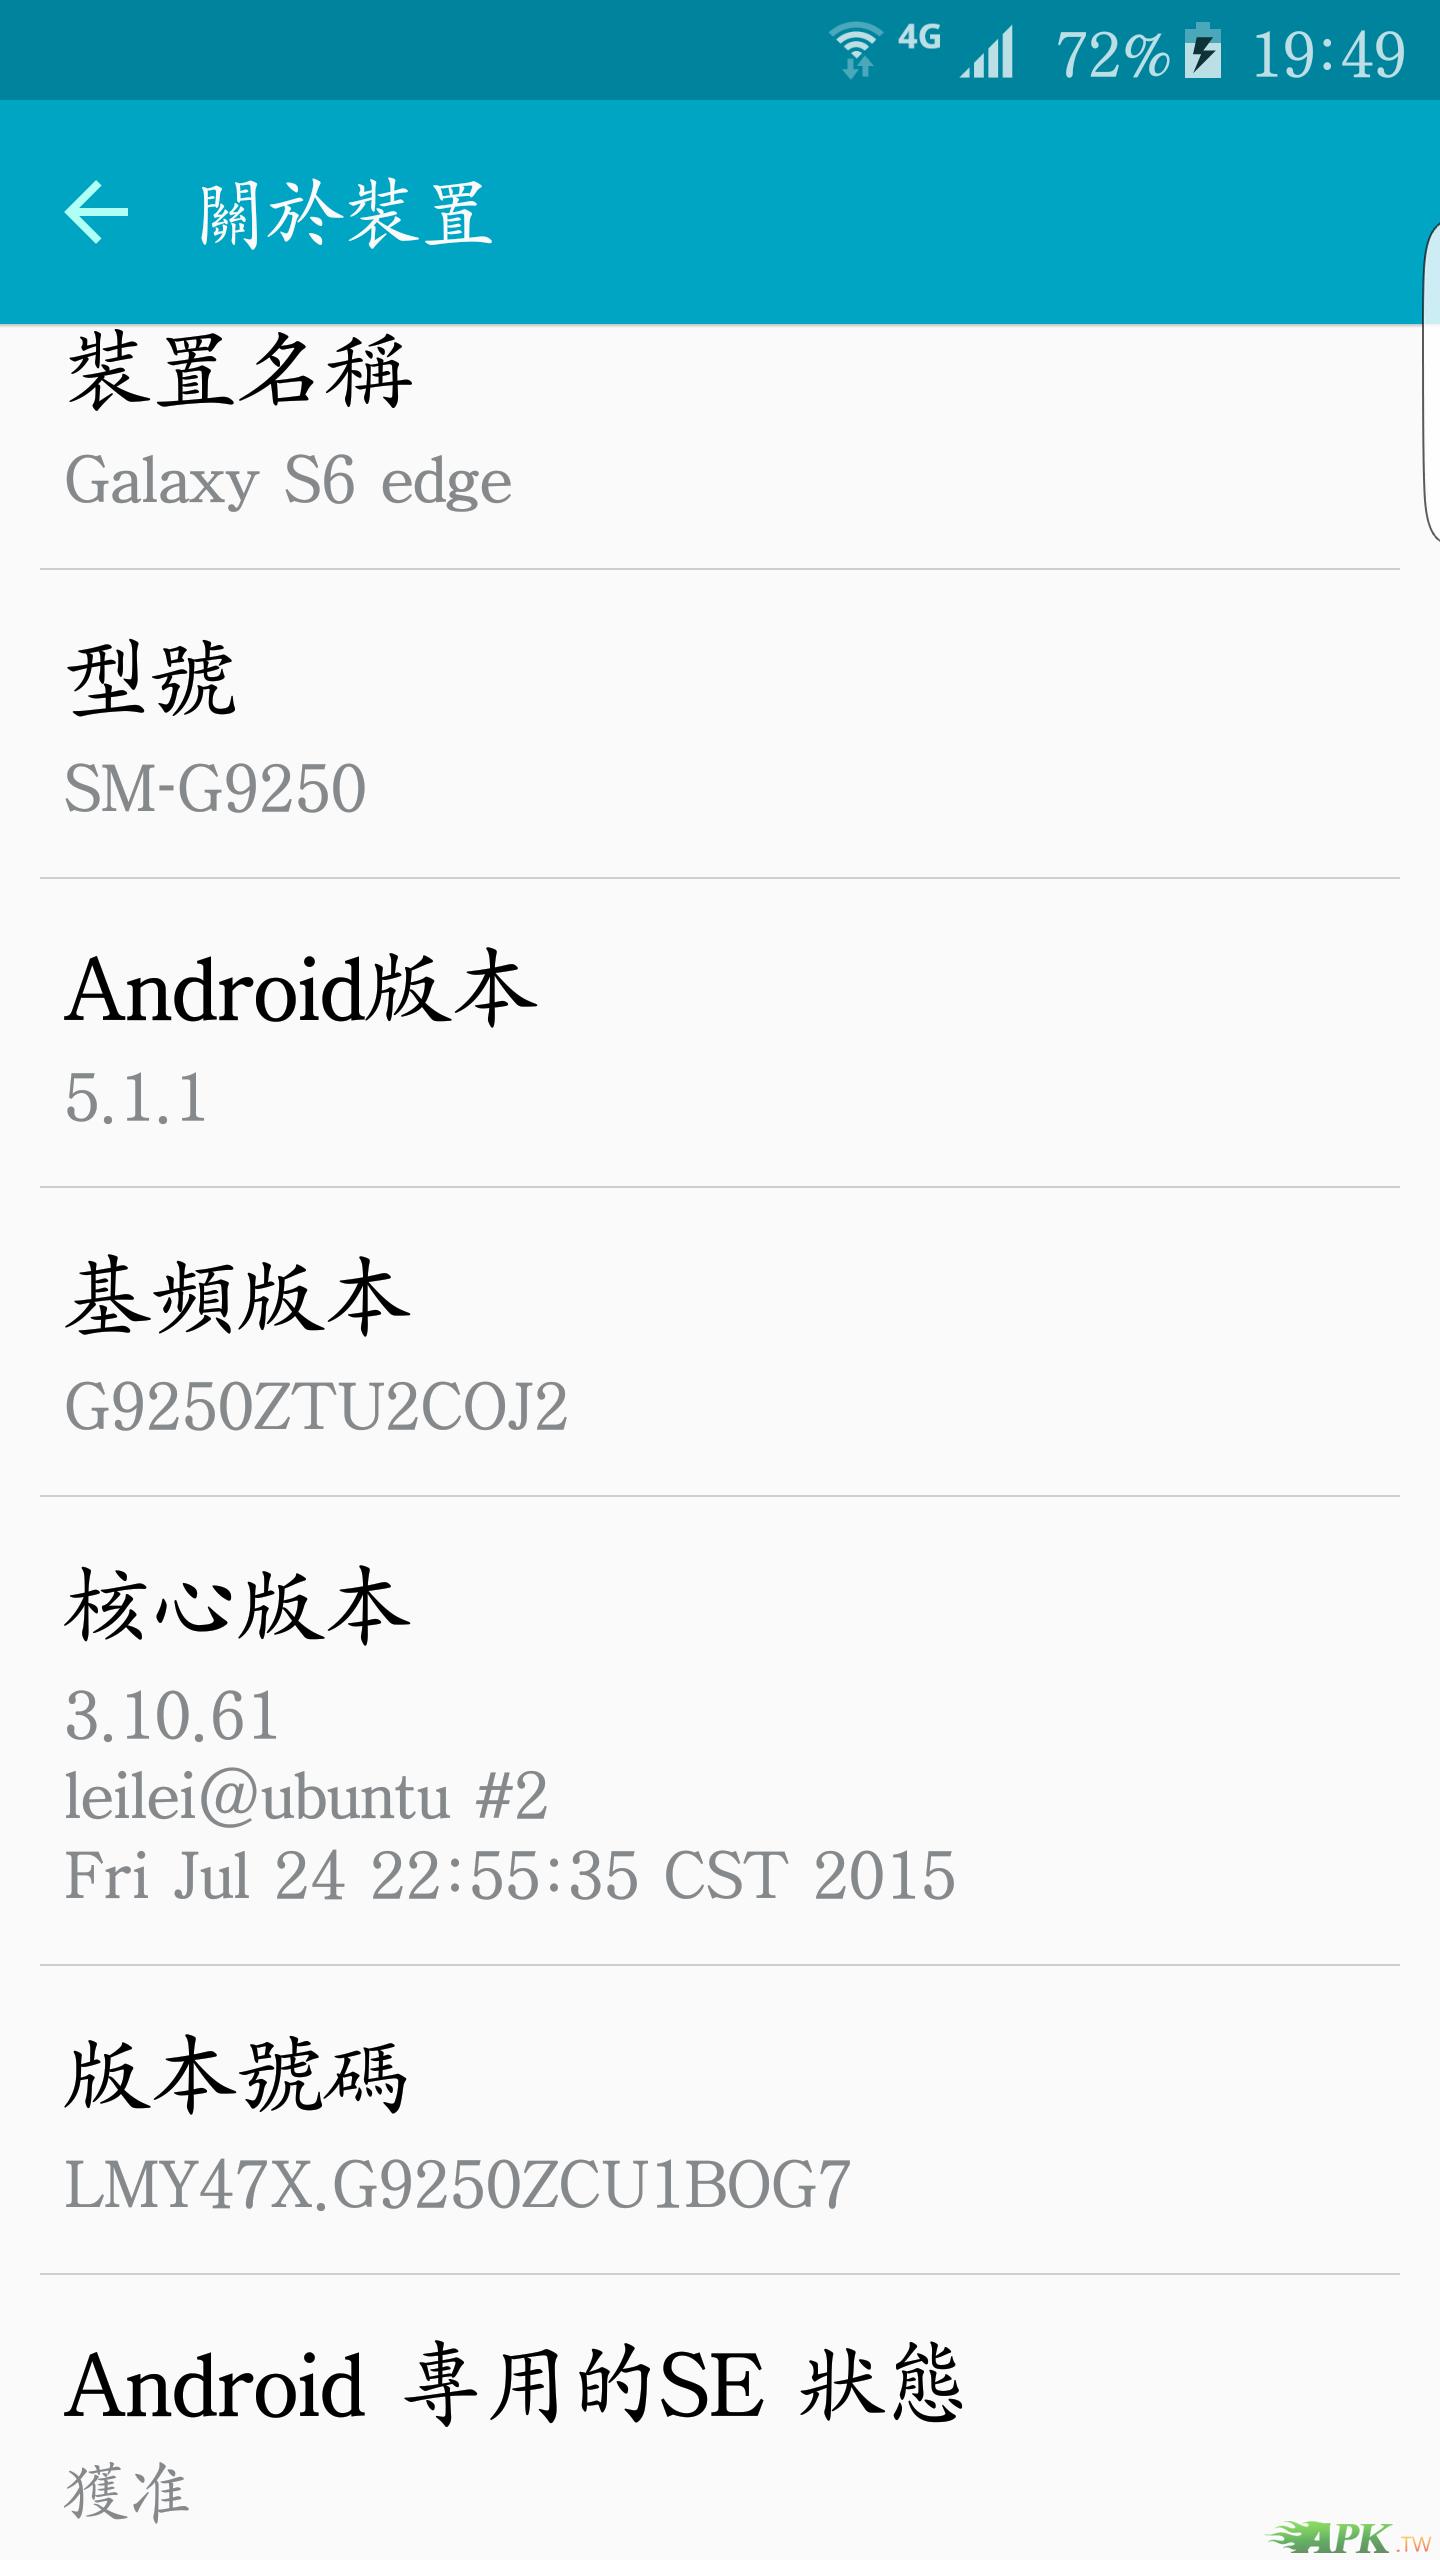 Screenshot_2015-11-02-19-49-10.png